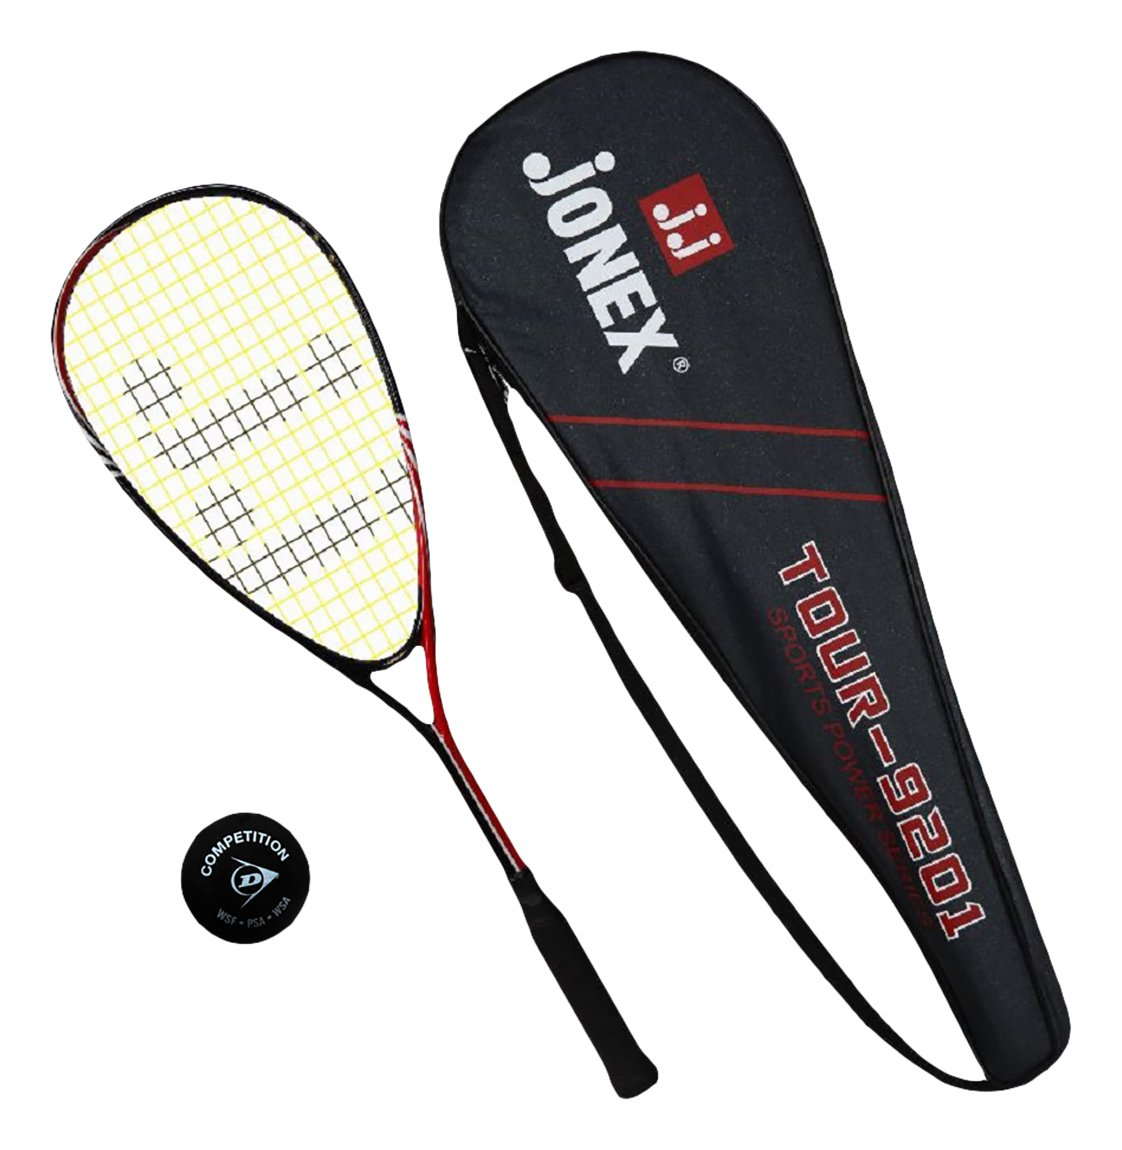 Best Squash Rackets